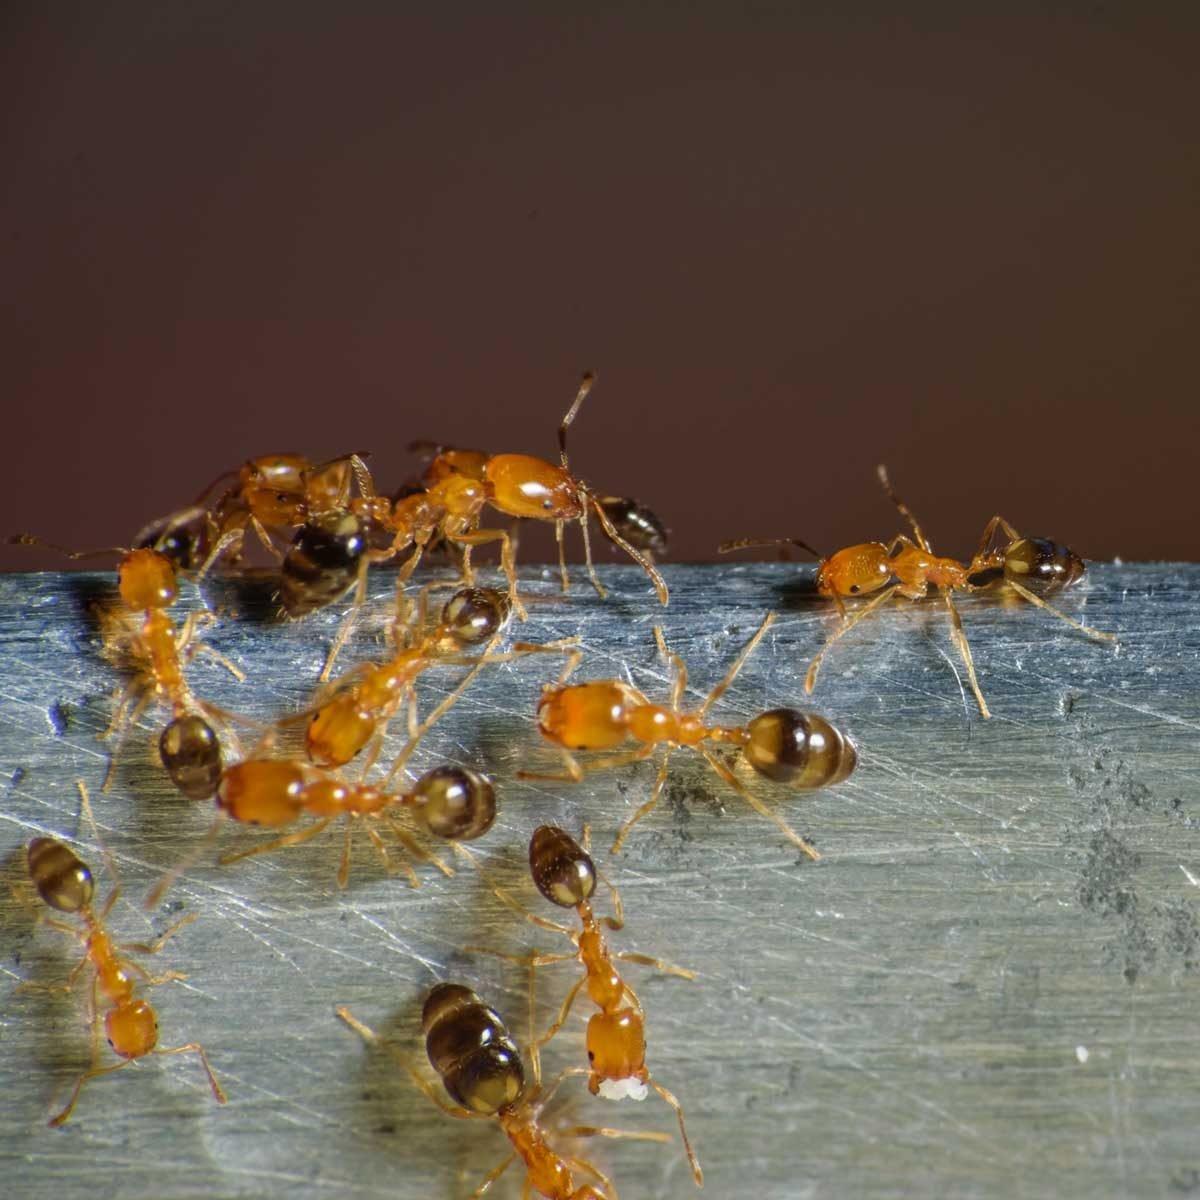 Pharoah ants